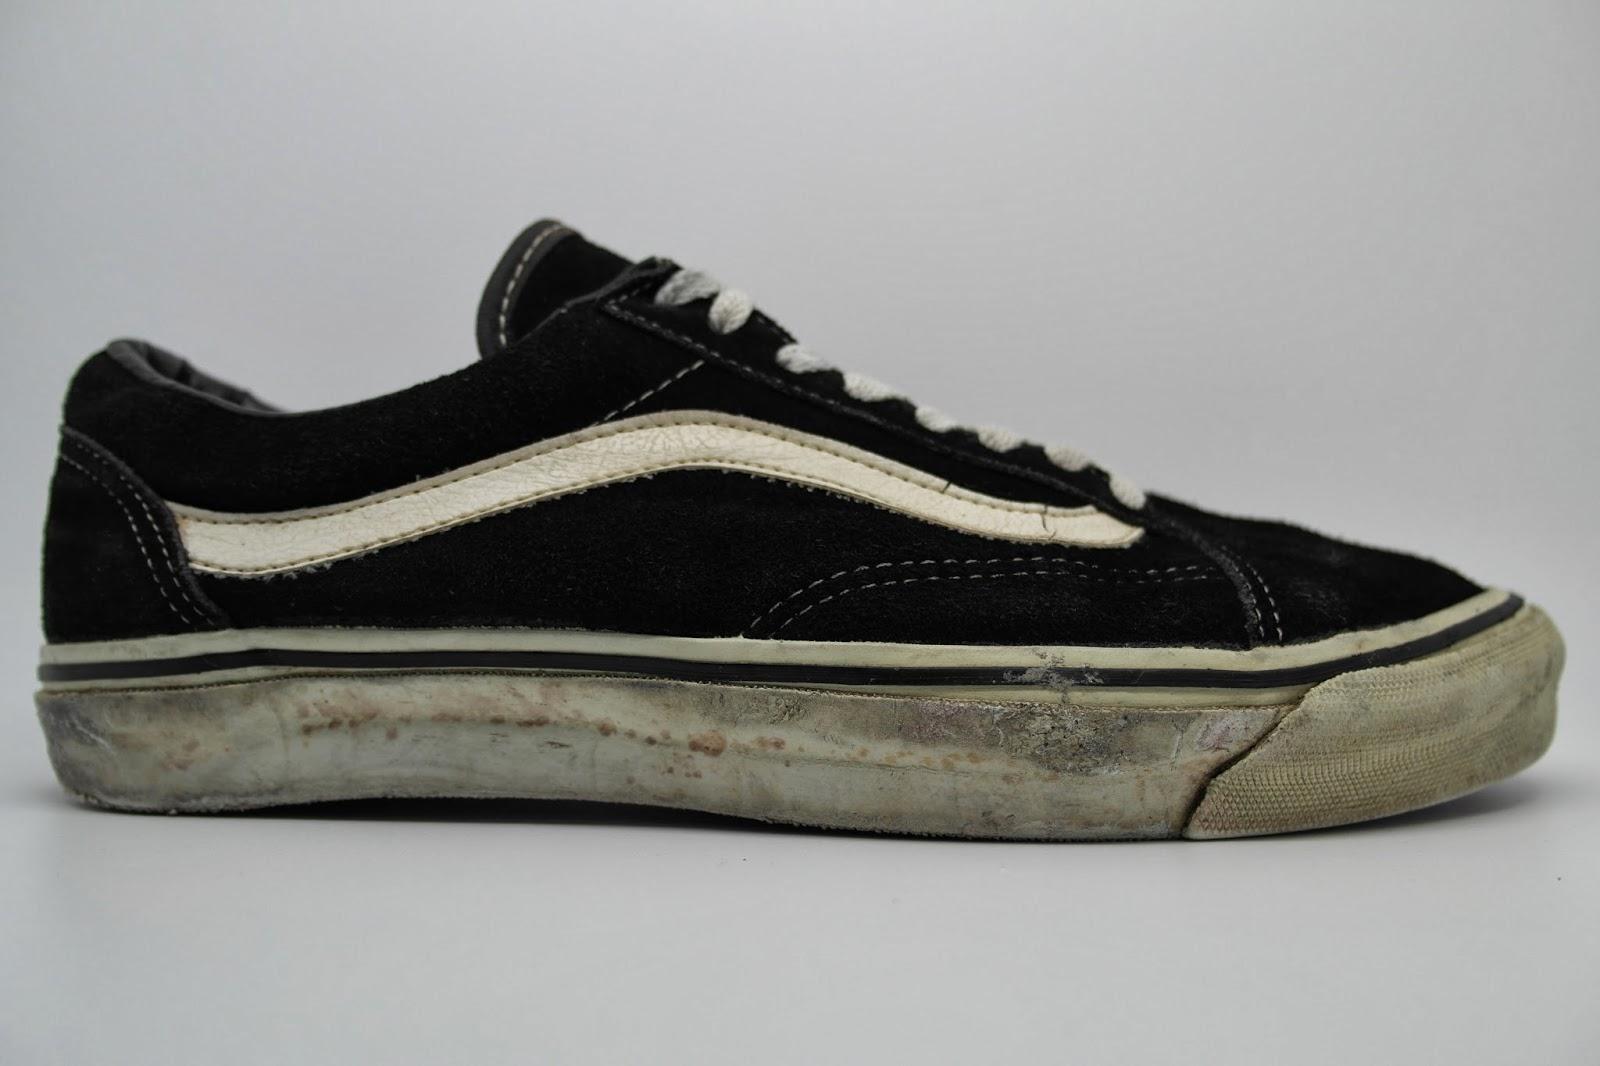 Van Shoes Thailand